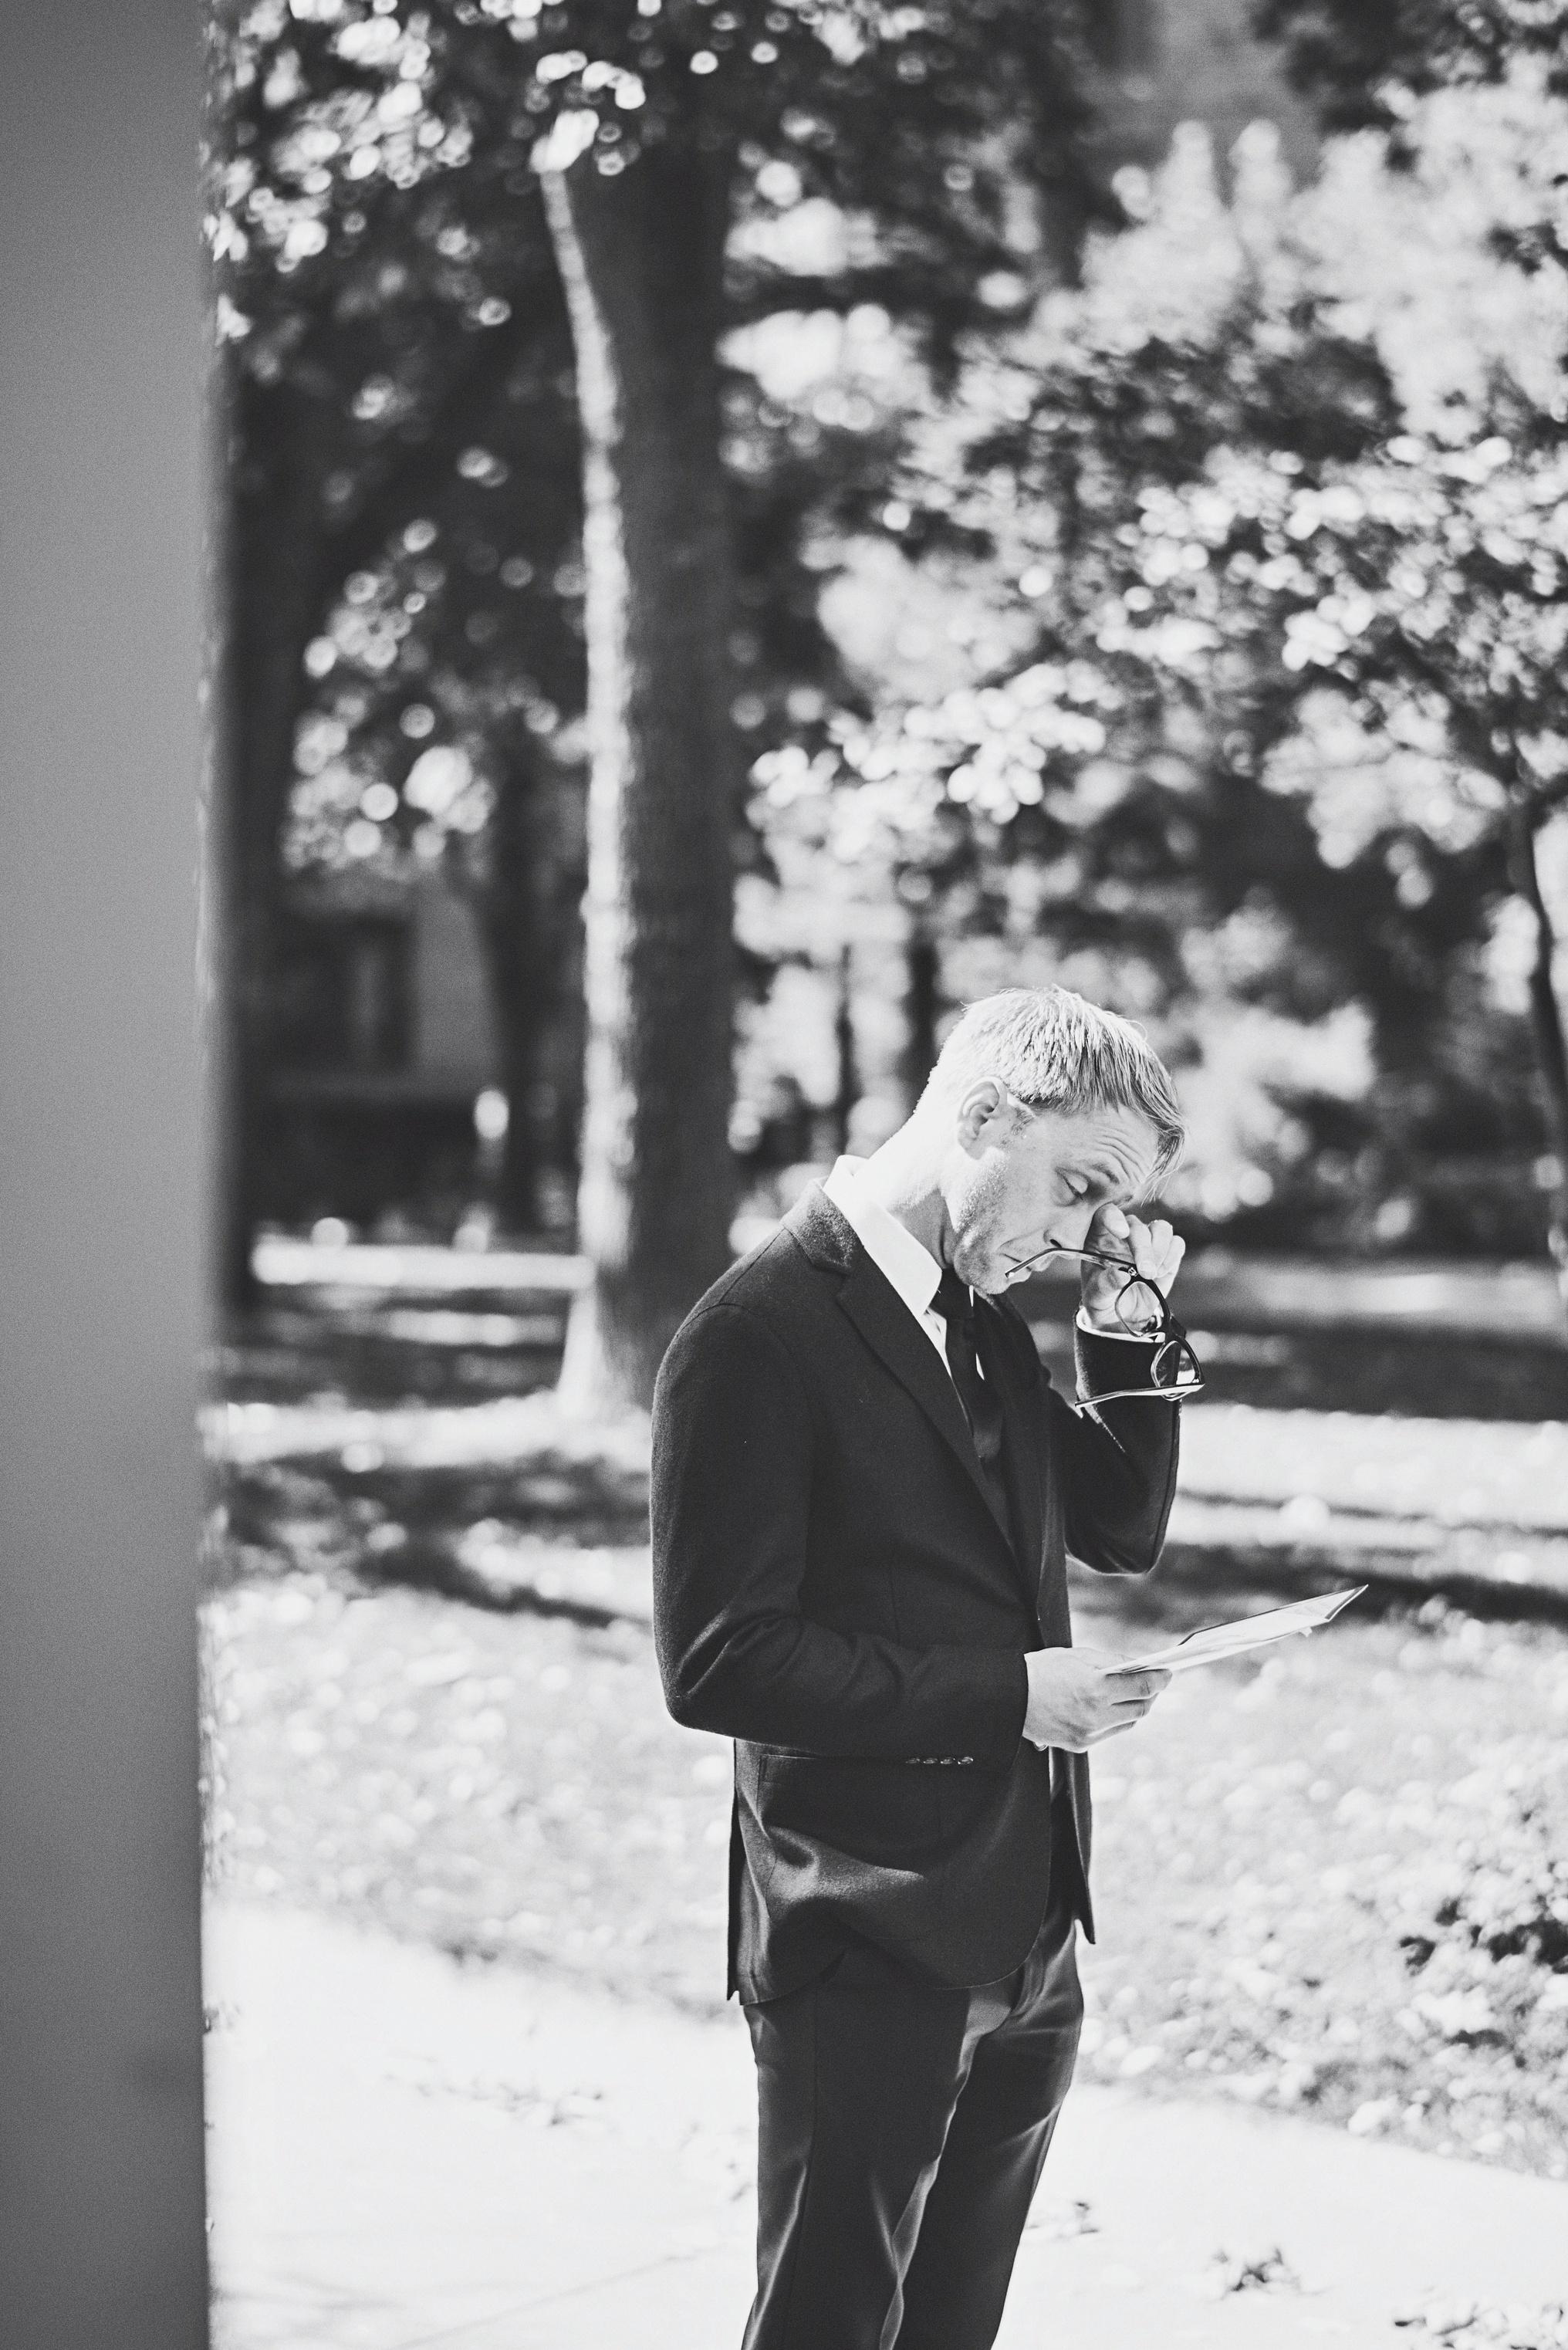 best_wedding_photography_2017_by_lucas_botz_photography_071.jpg